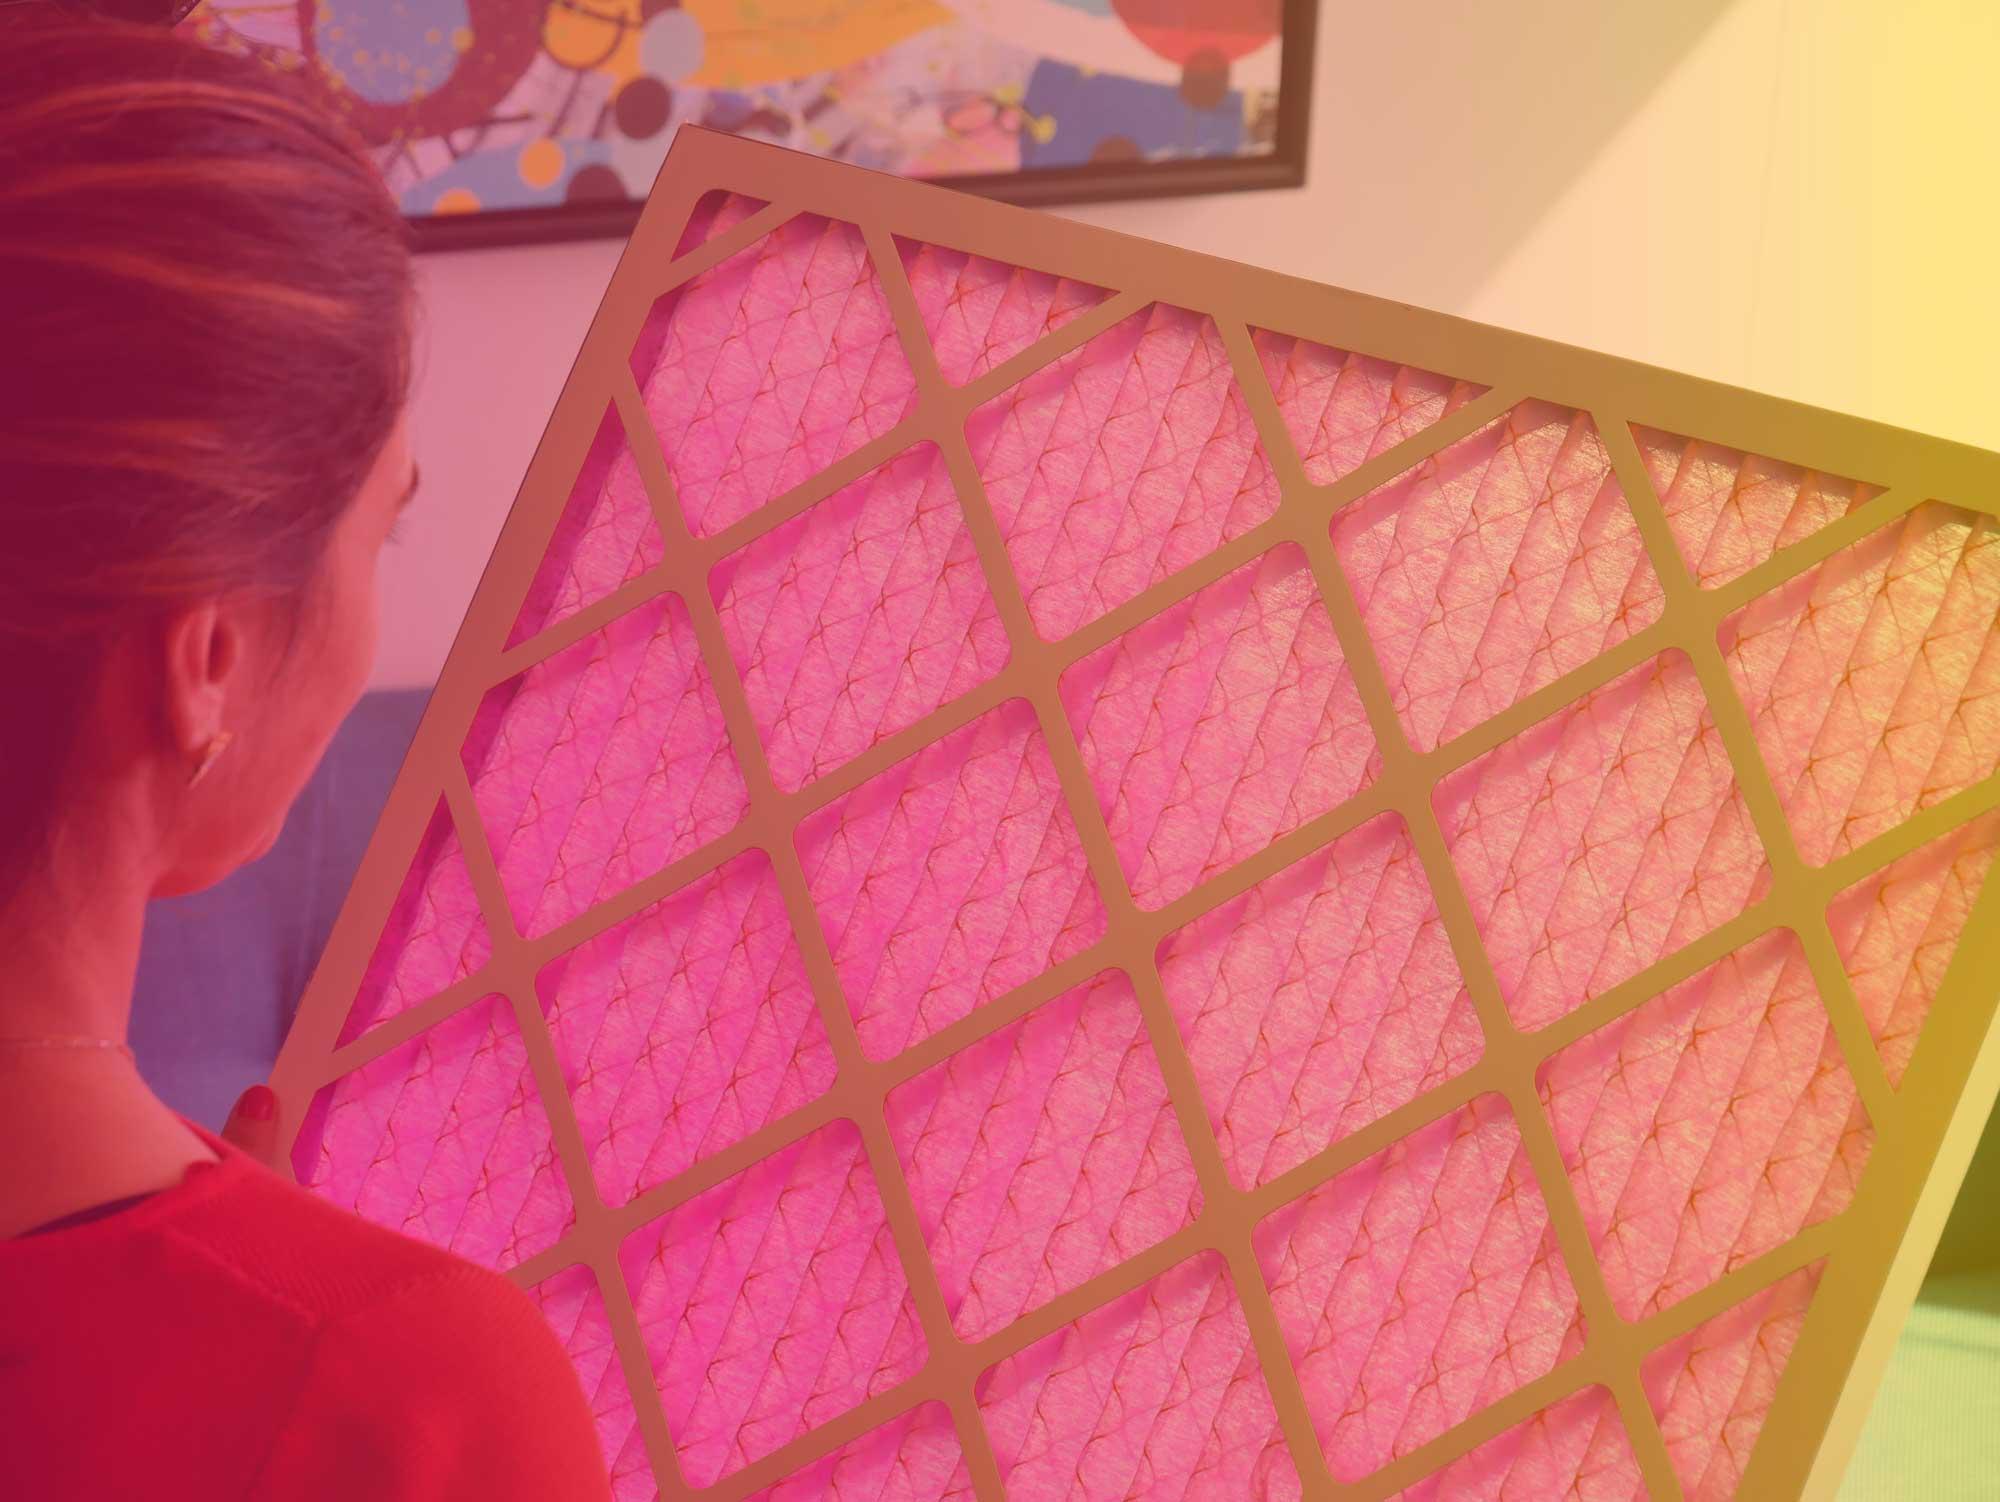 colorfil hvac filter